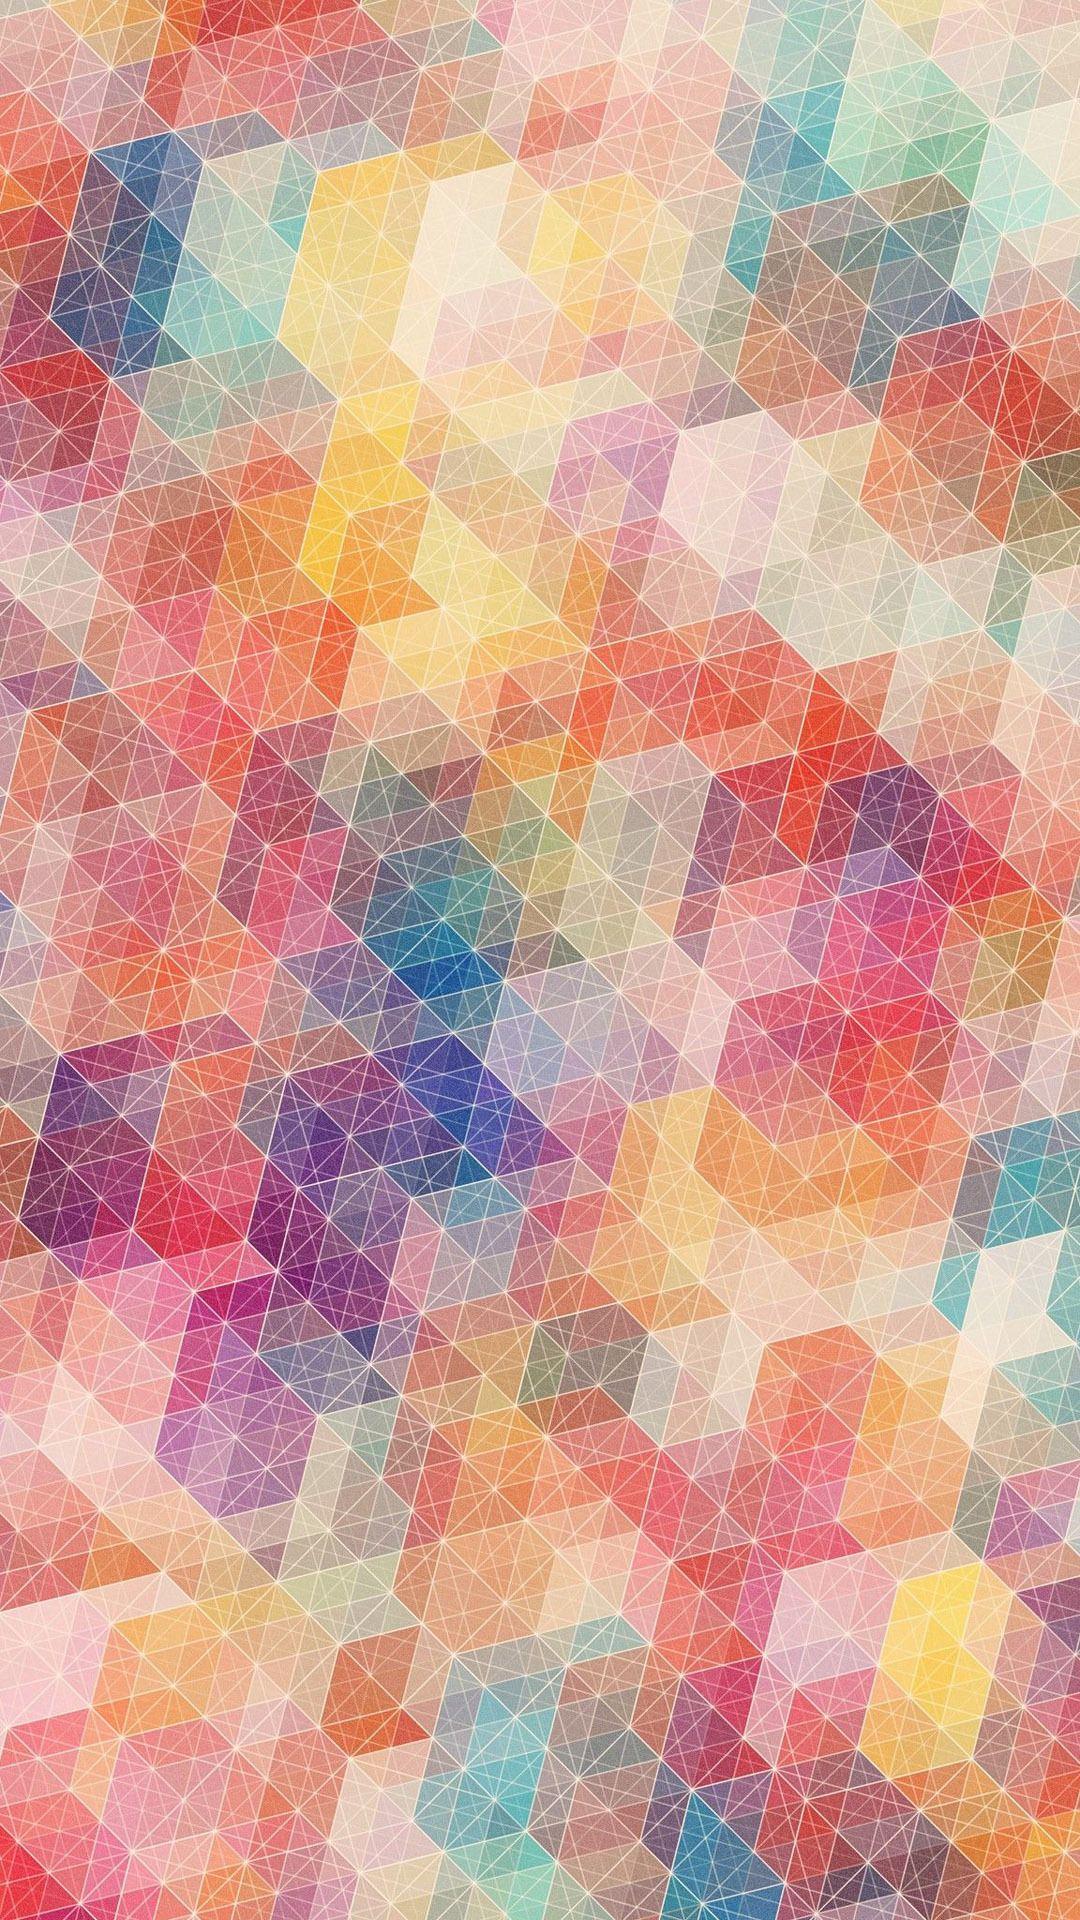 Beautiful Wallpaper High Quality Pastel - 621159a7b6dda61c6bdfe8656d70e877  Pictures_901842.jpg